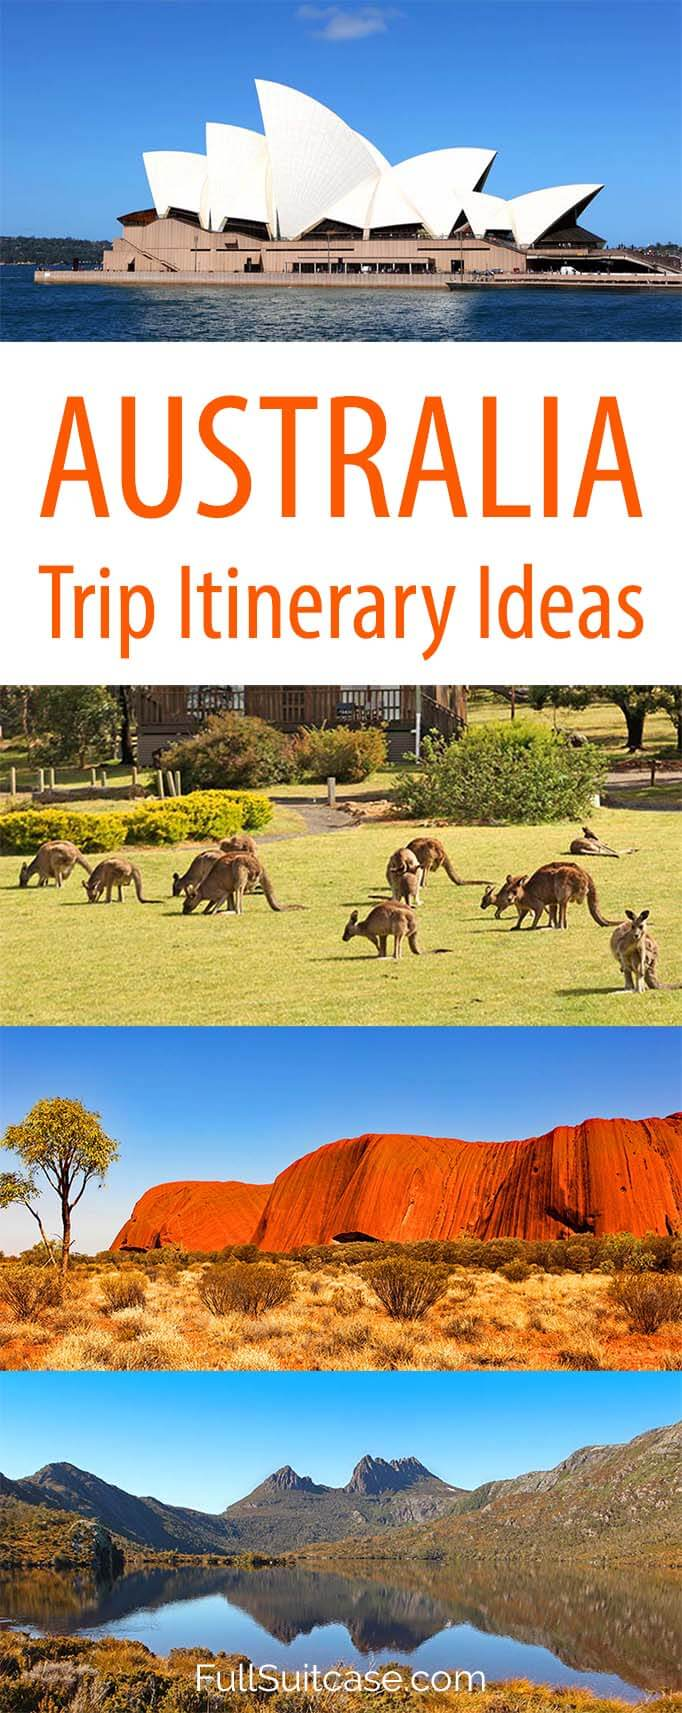 Australia trip itinerary ideas